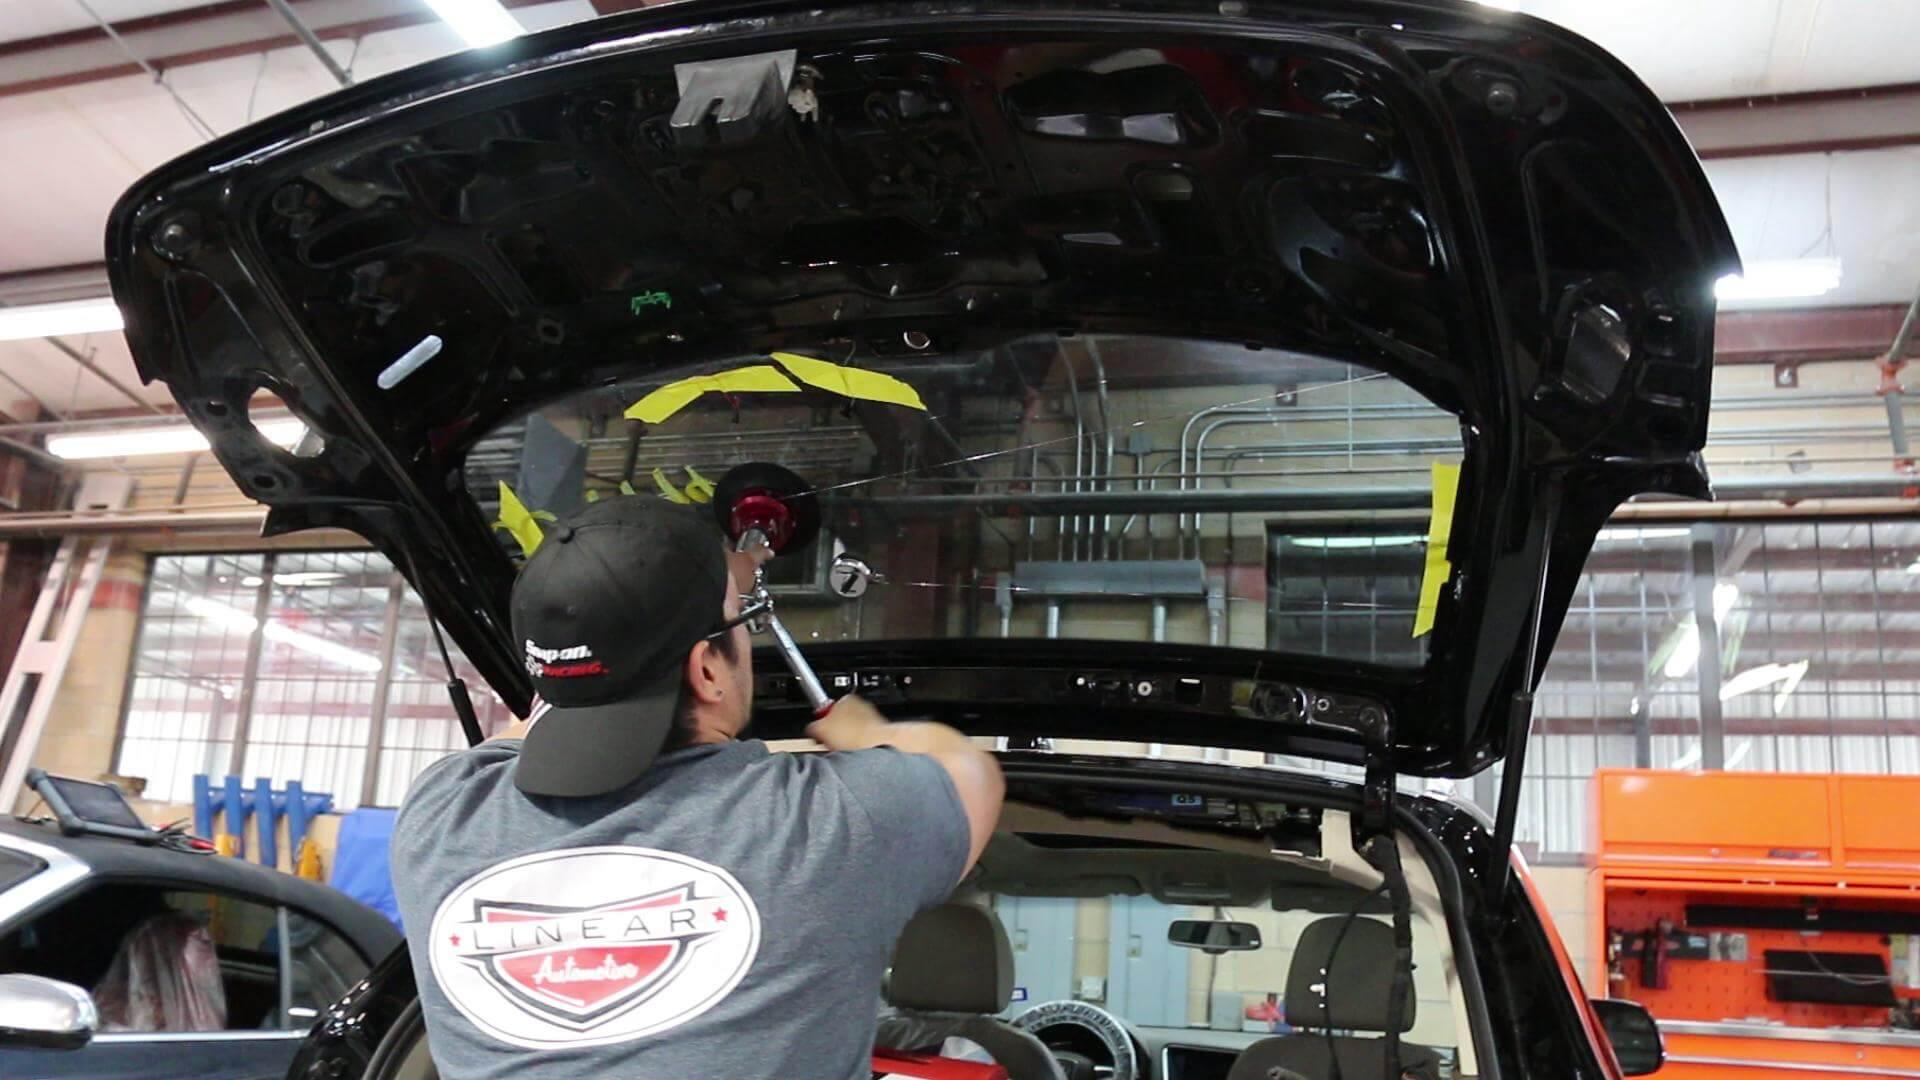 Hatchback_Repair_Plano_Texas